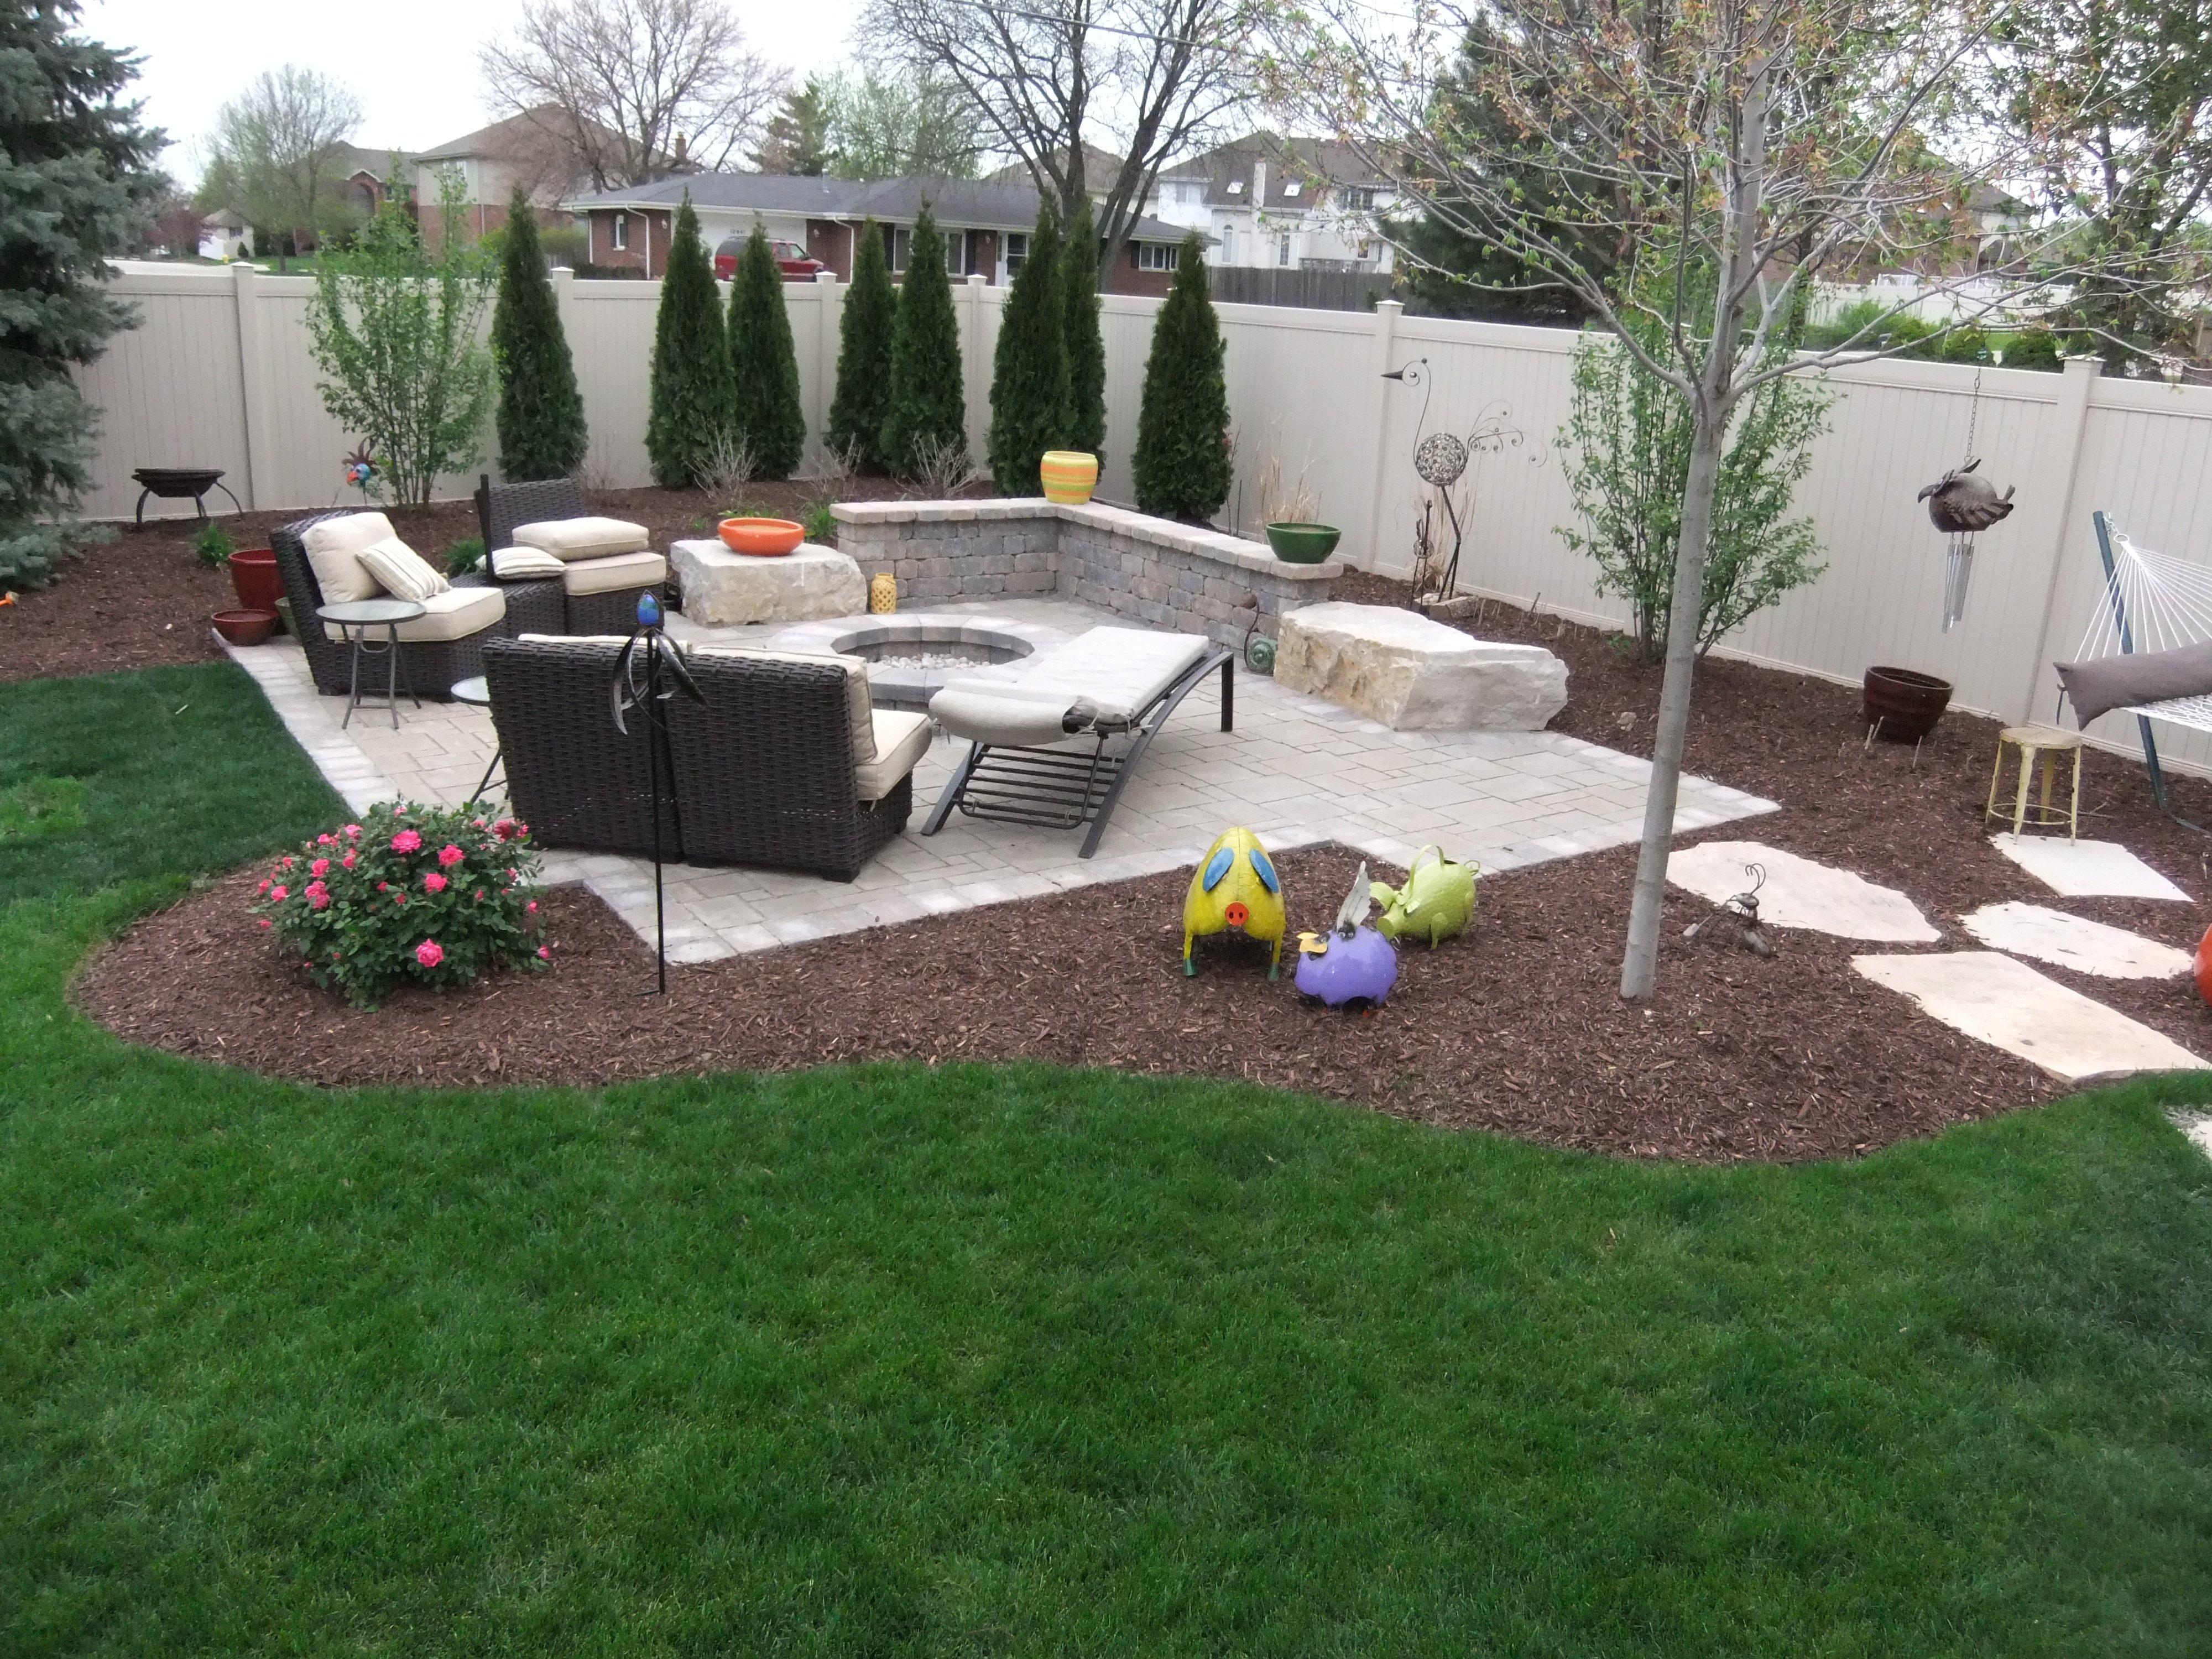 landscape u0026 garden contractors homer glen lockport u0026 hinsdale